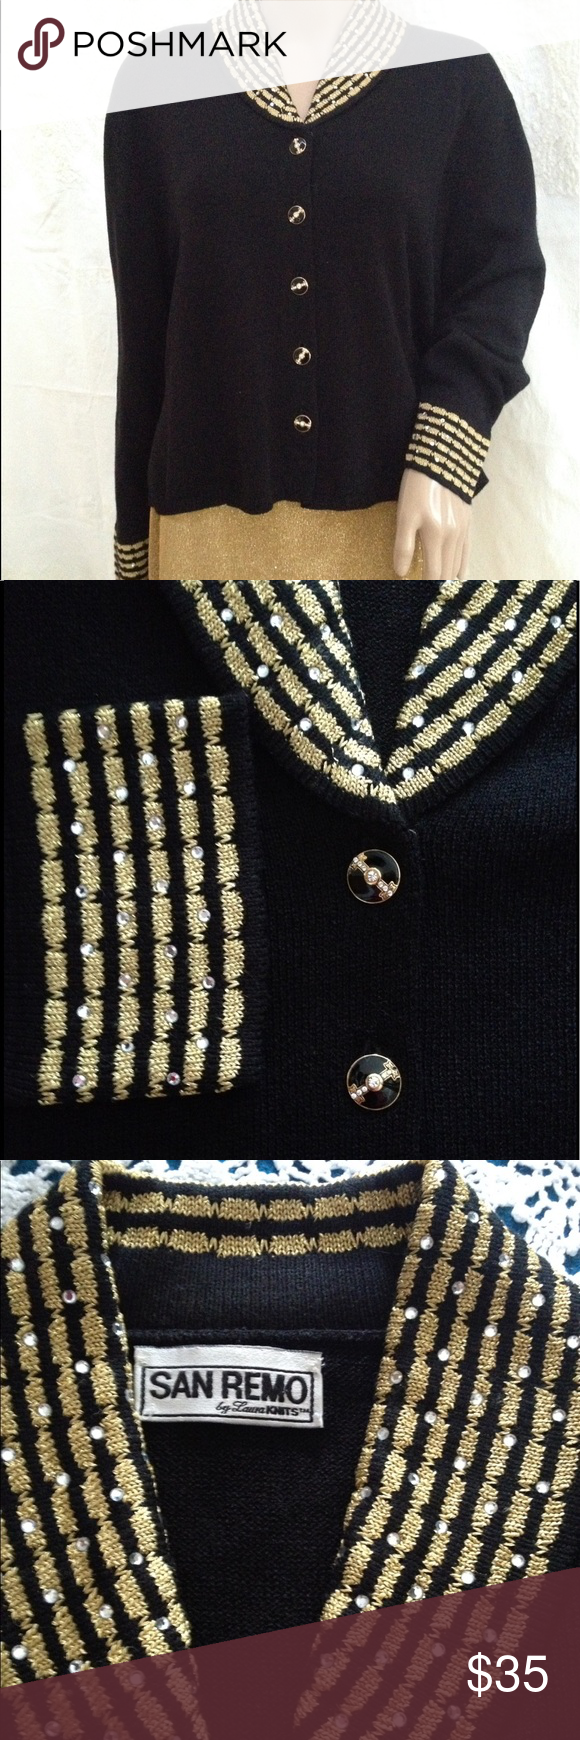 Vintage San Remo Laura Knits Black Gold Cardigan 90% acrylic, 10 ...